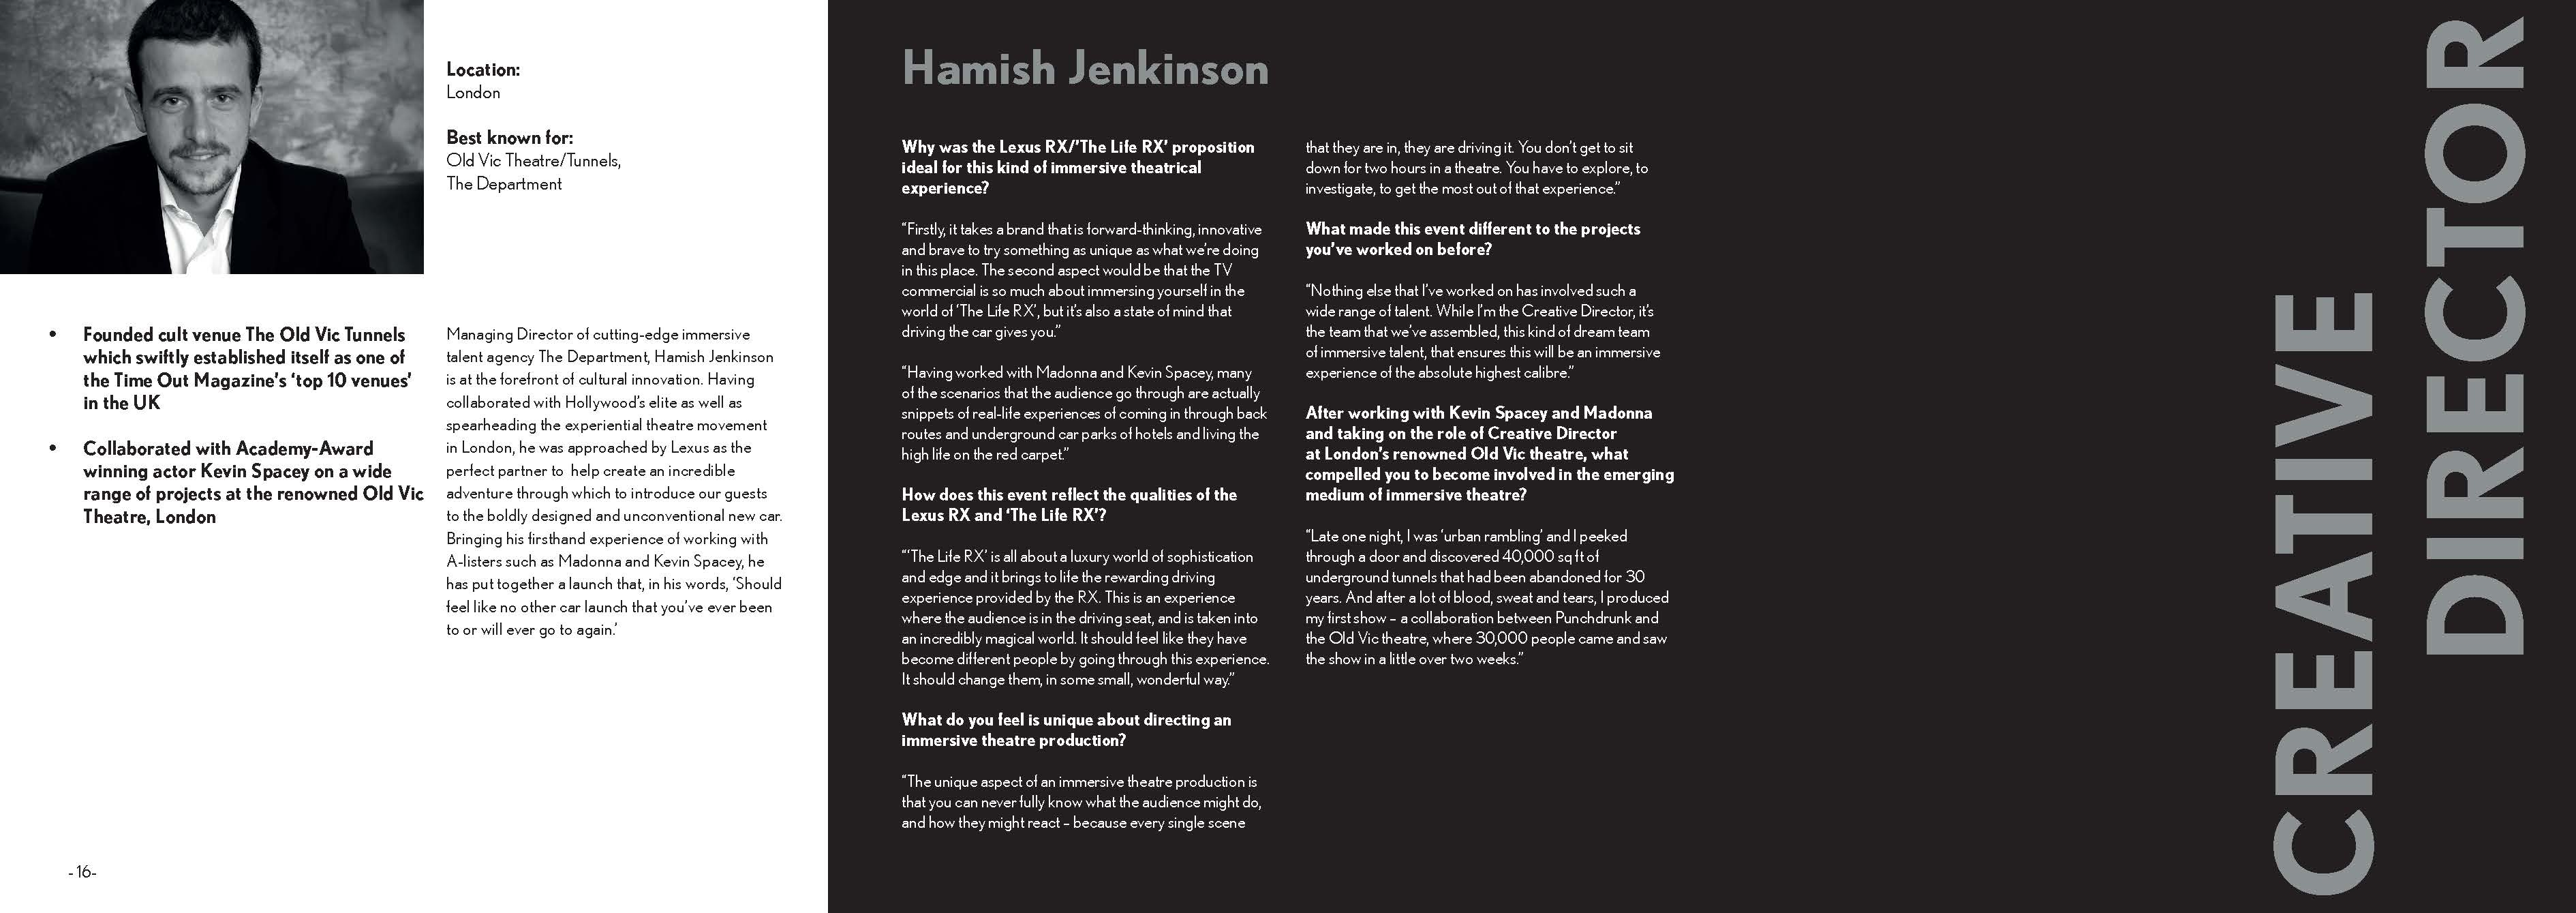 Hamish Jenkinson